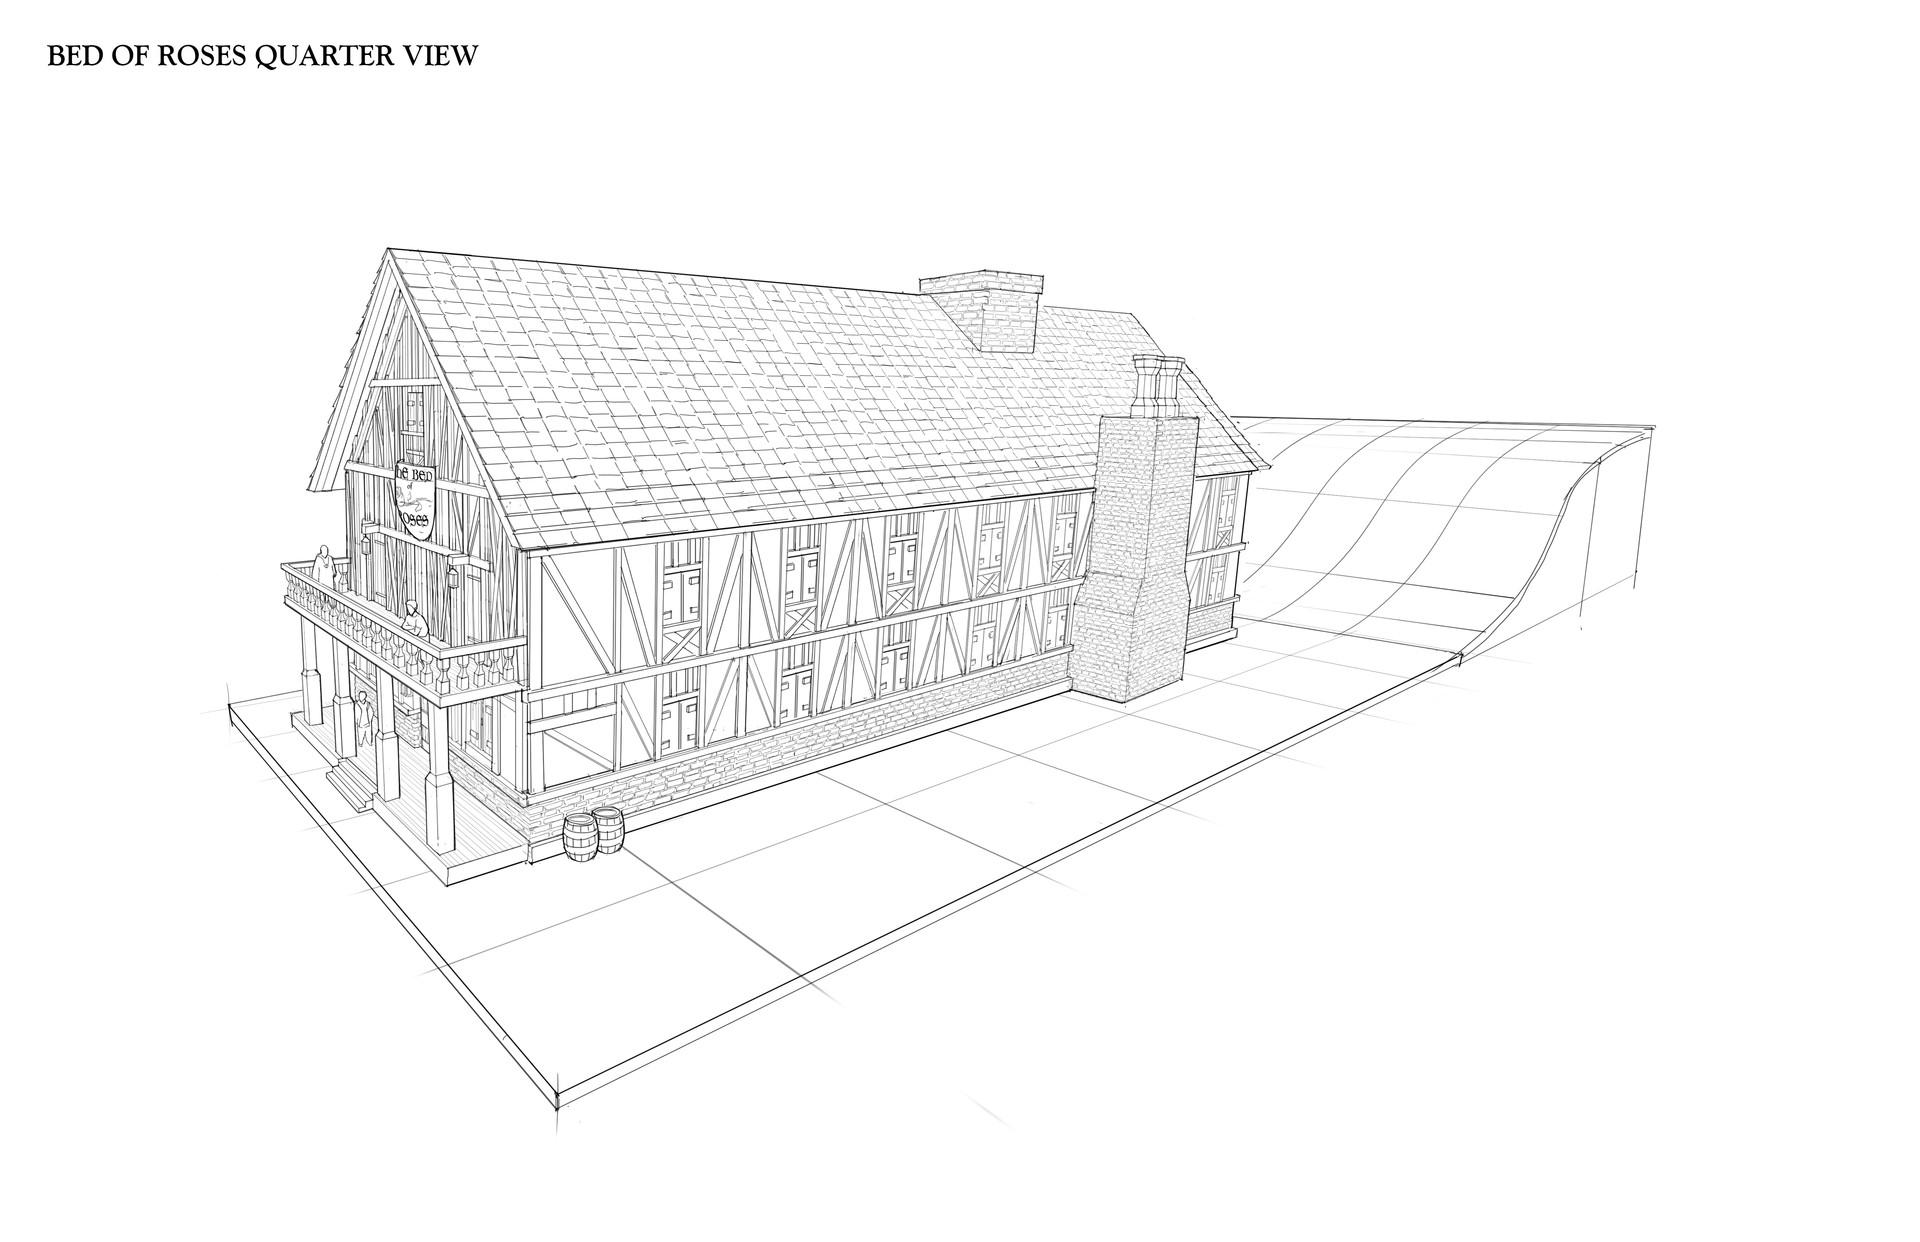 paul-chang-weldon-sketches-quarterview-v2.jpg